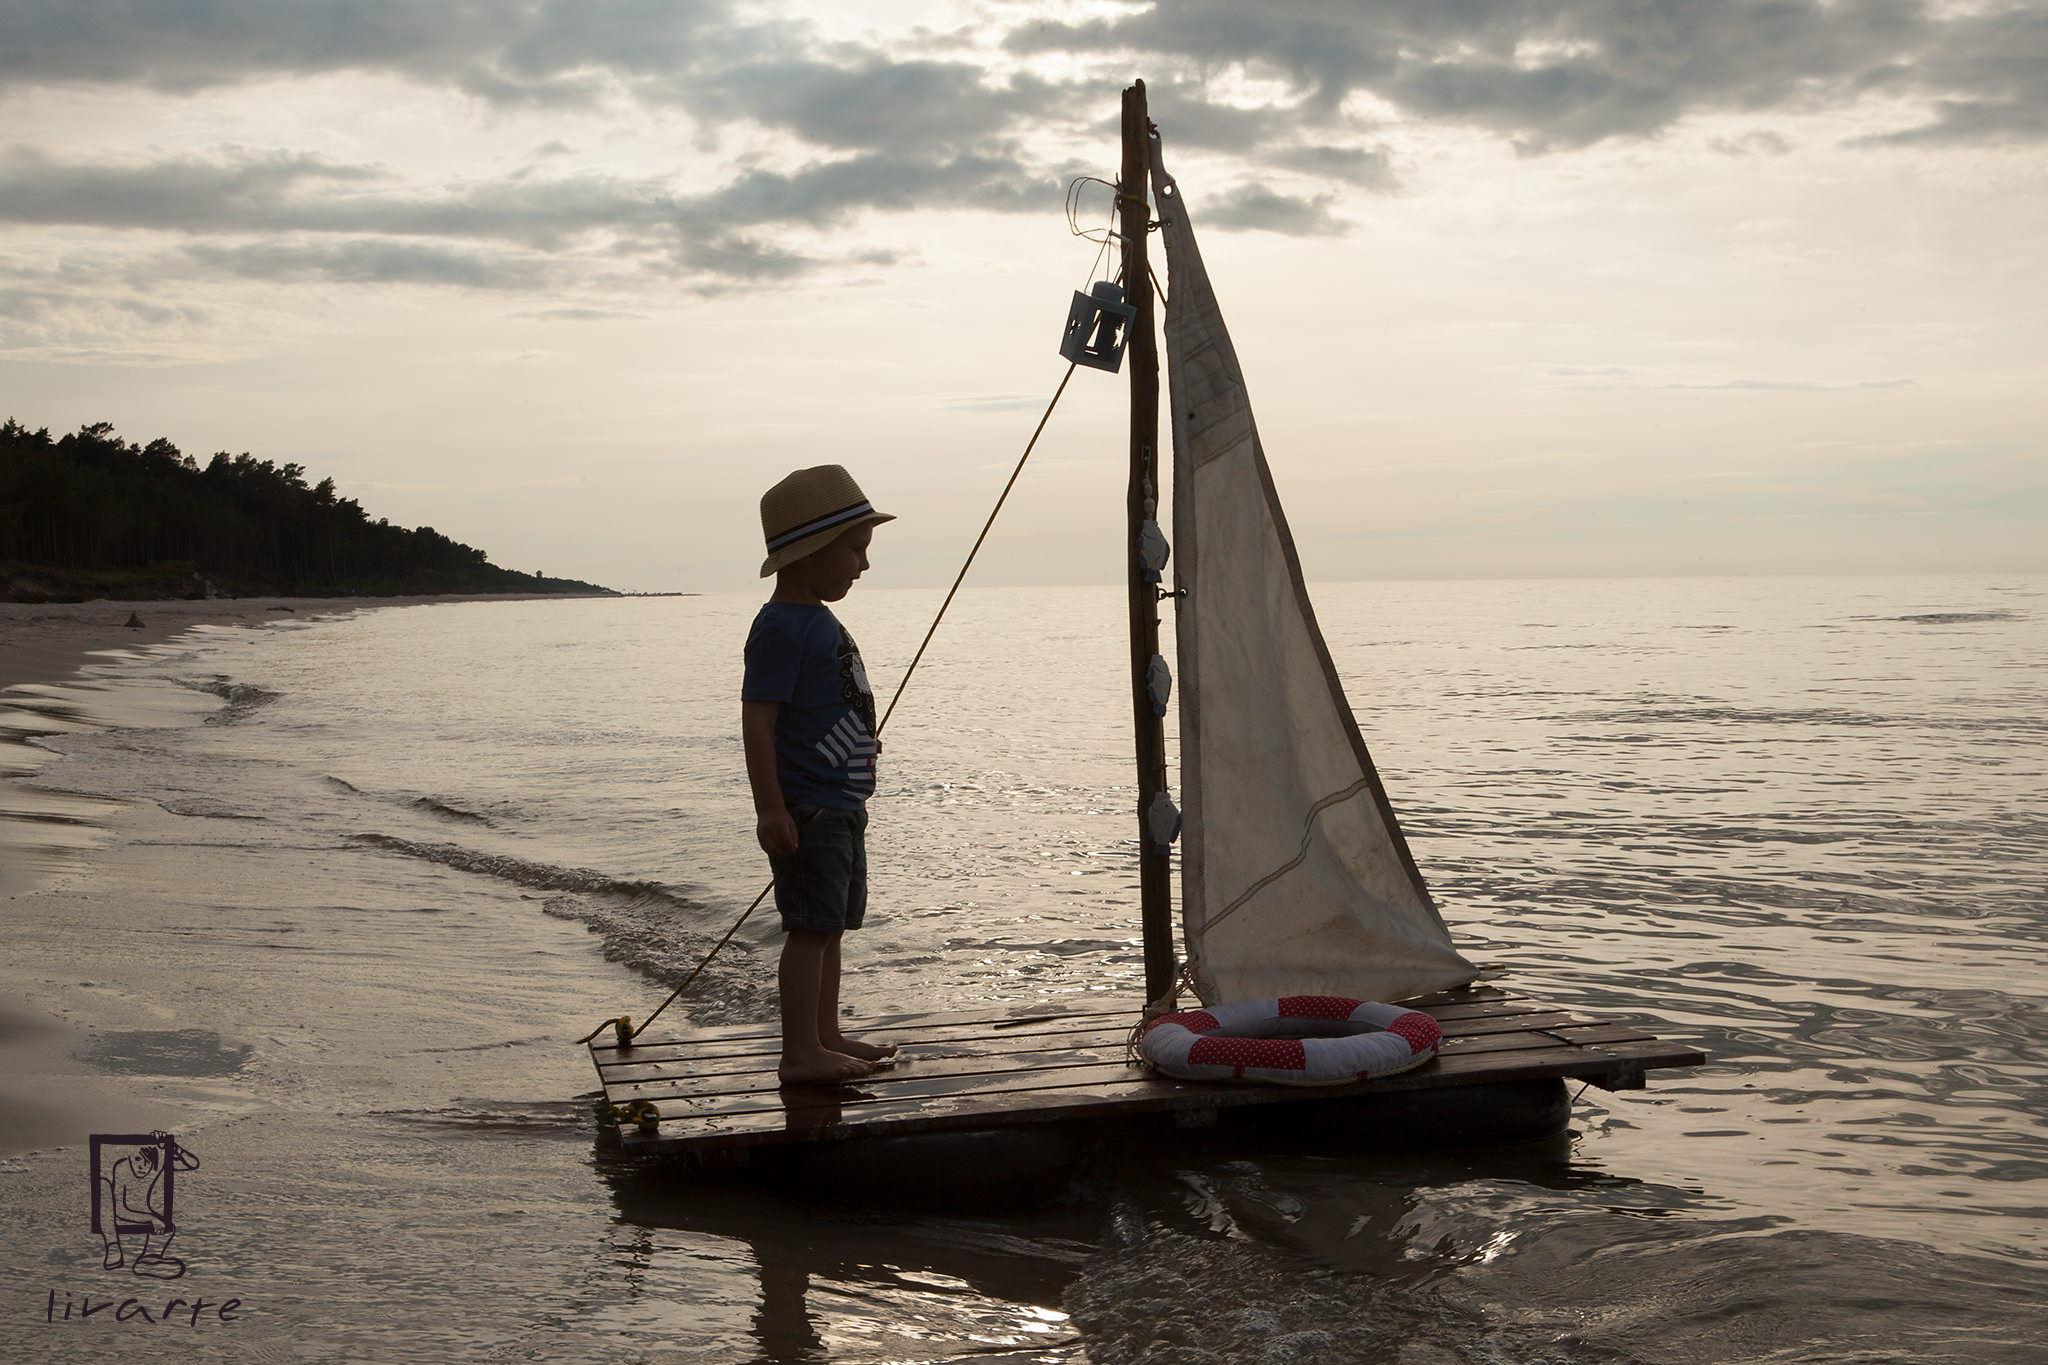 Sesje nad morzem - Livarte